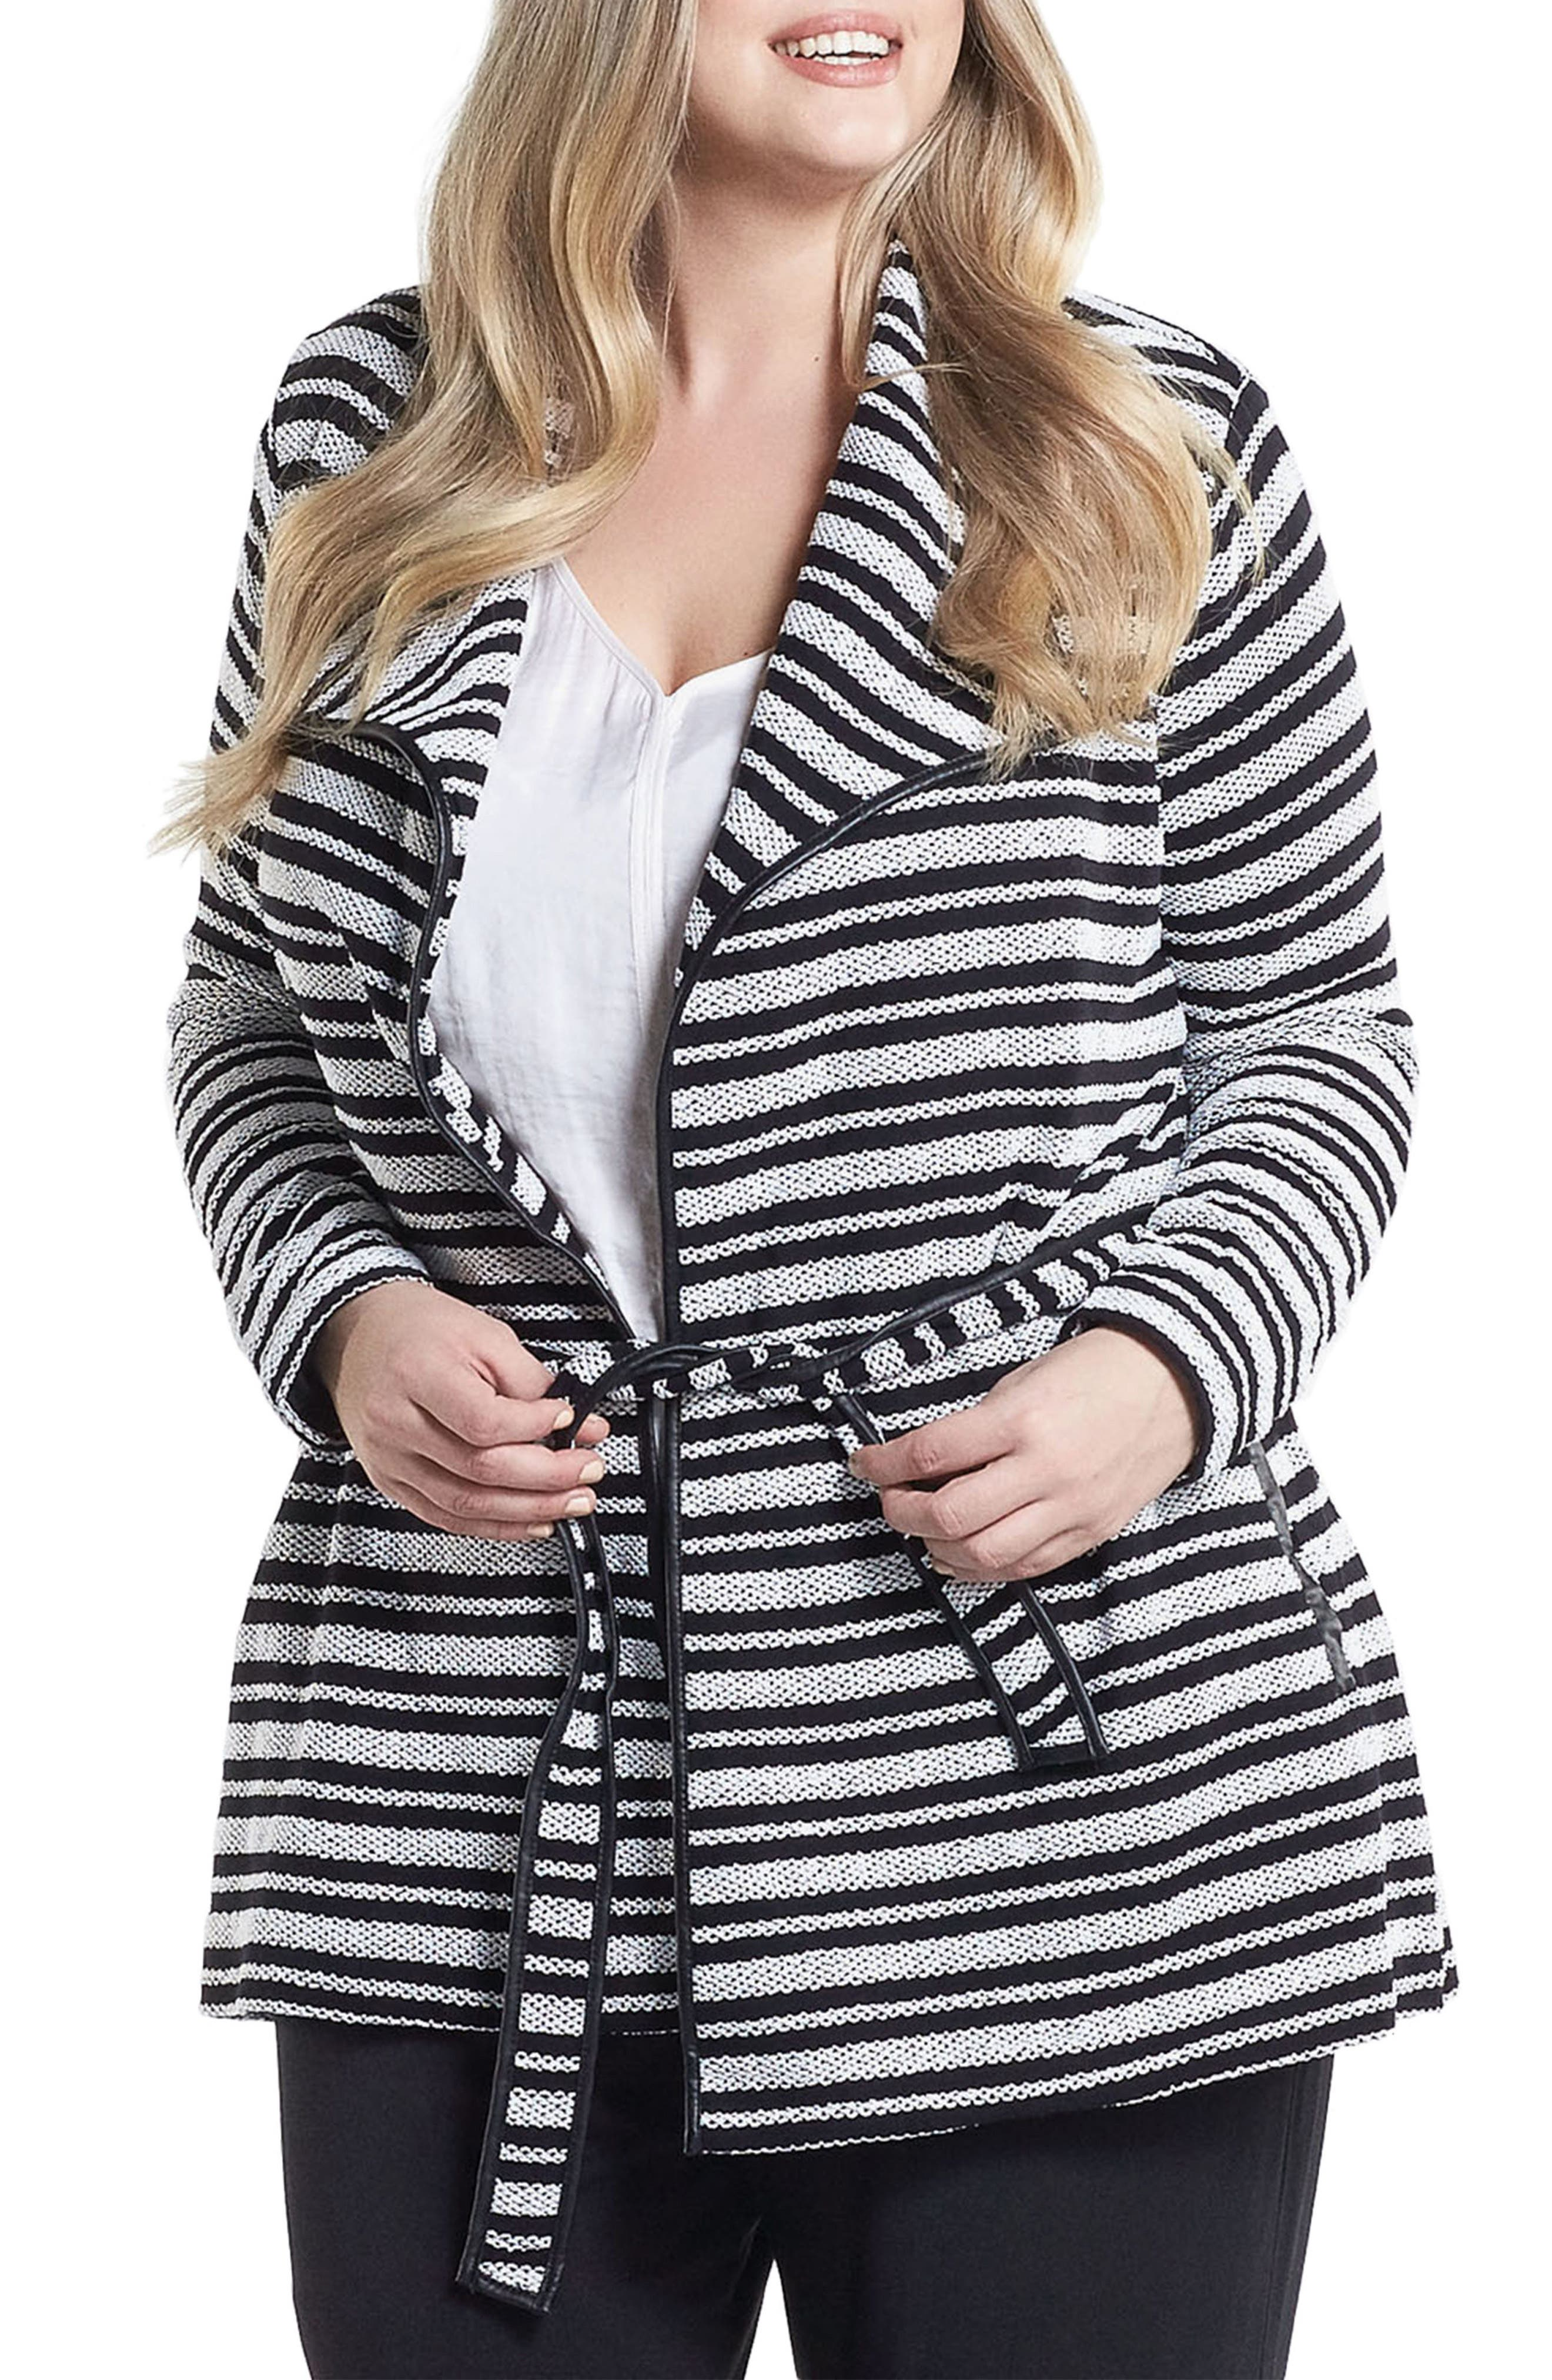 Xena Belted Stripe Knit Jacket,                         Main,                         color, Black/ White Stripe